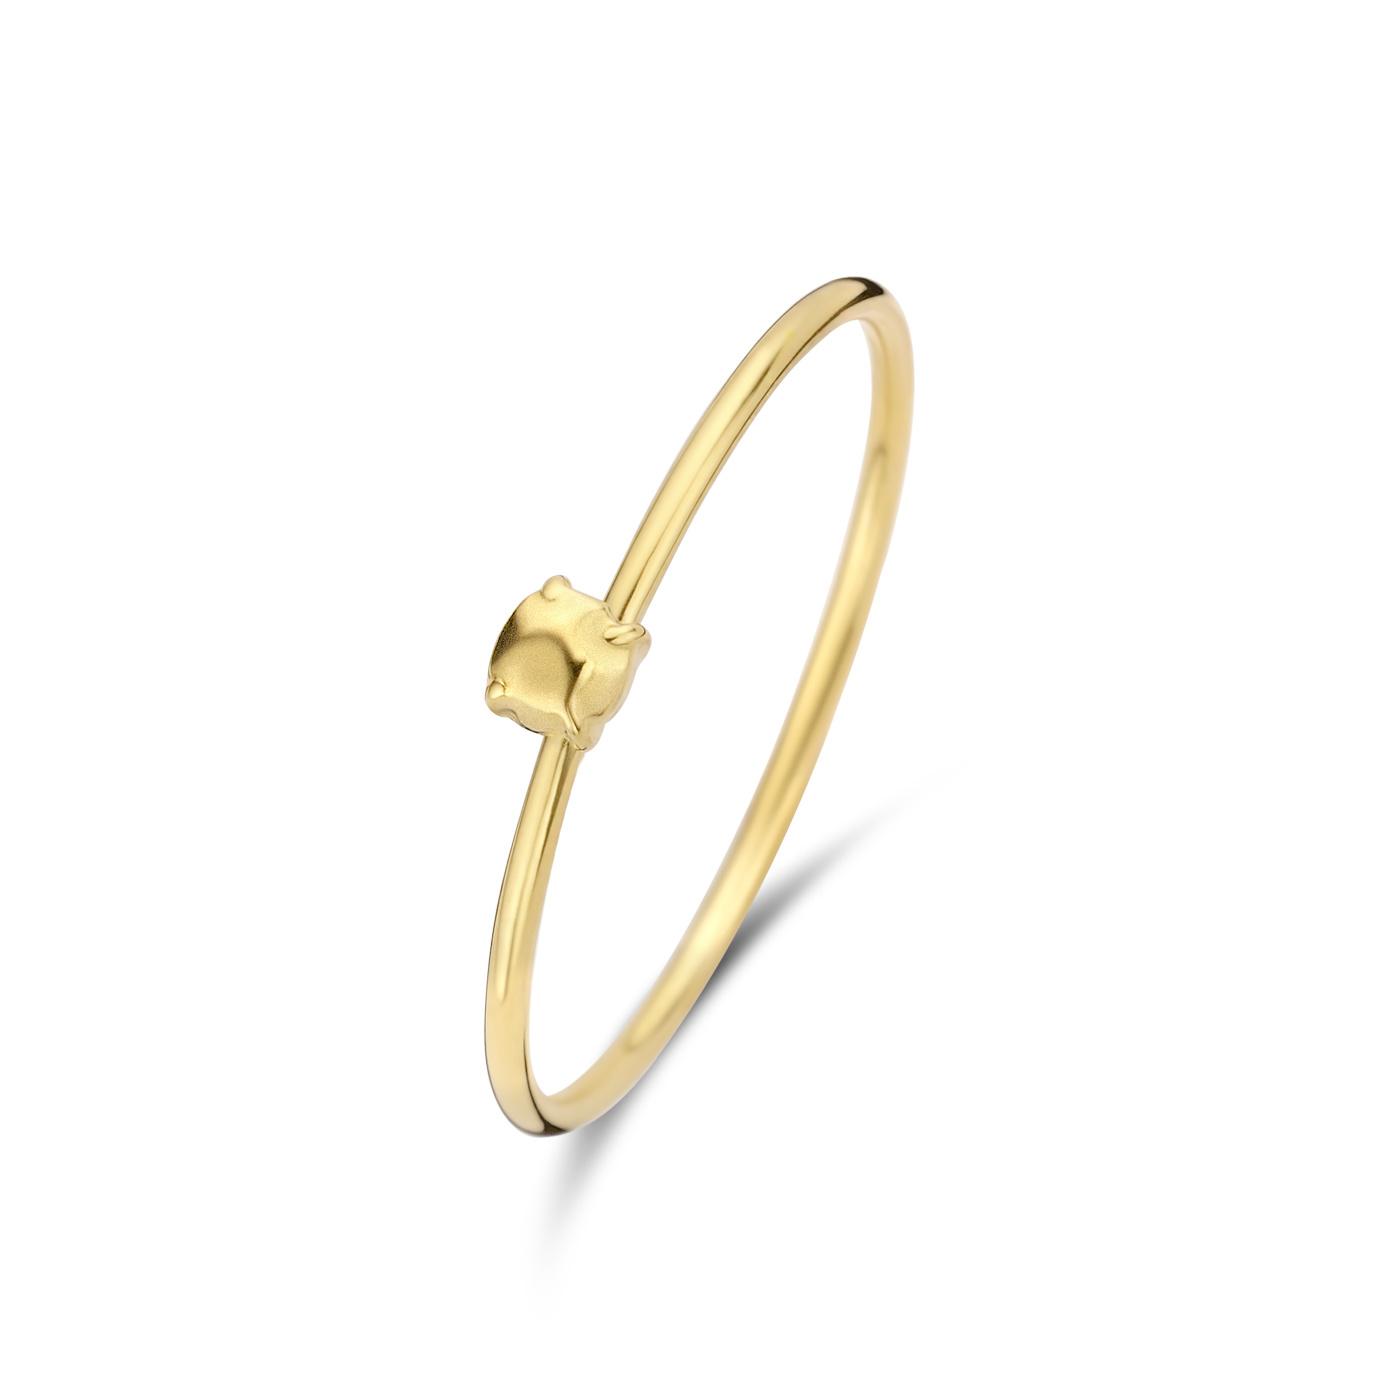 Violet Hamden Sisterhood Stone 925 Sterling Silber goldfarbenes Ring mit Stein